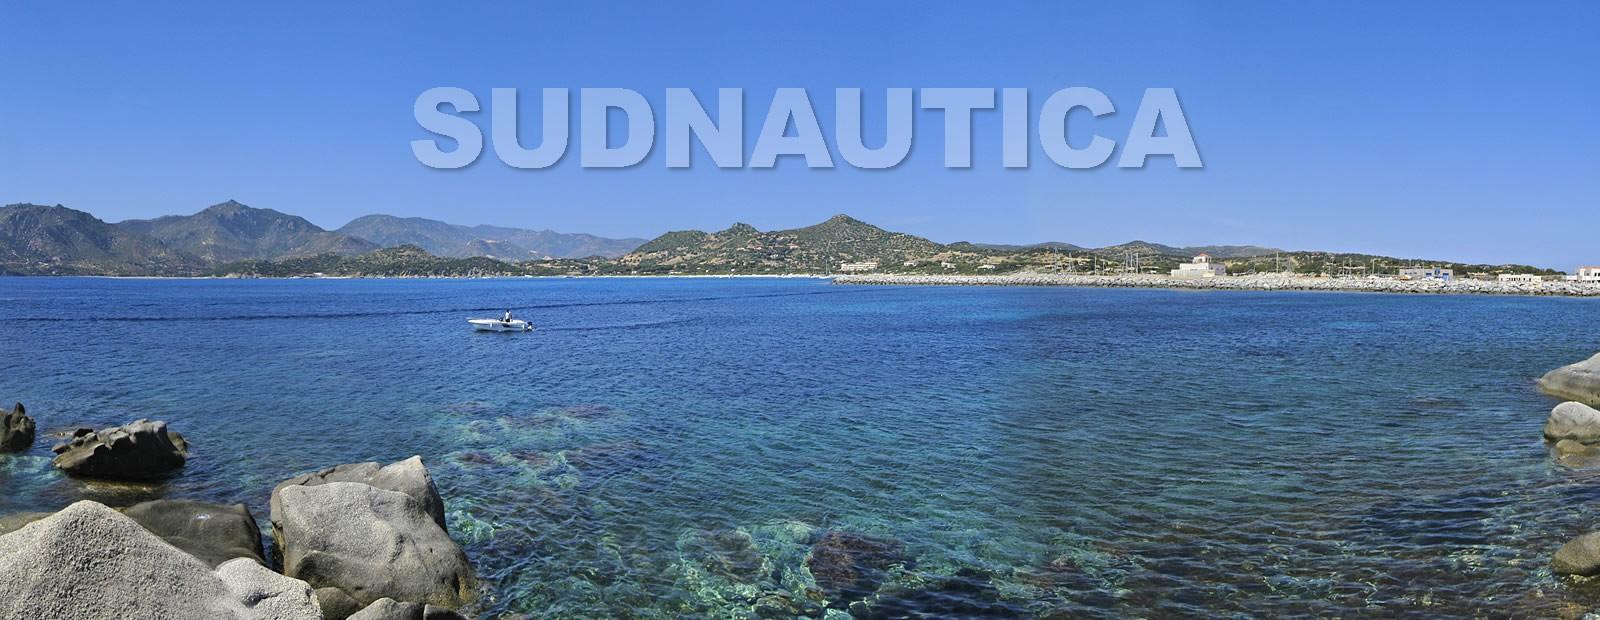 sudnautica4